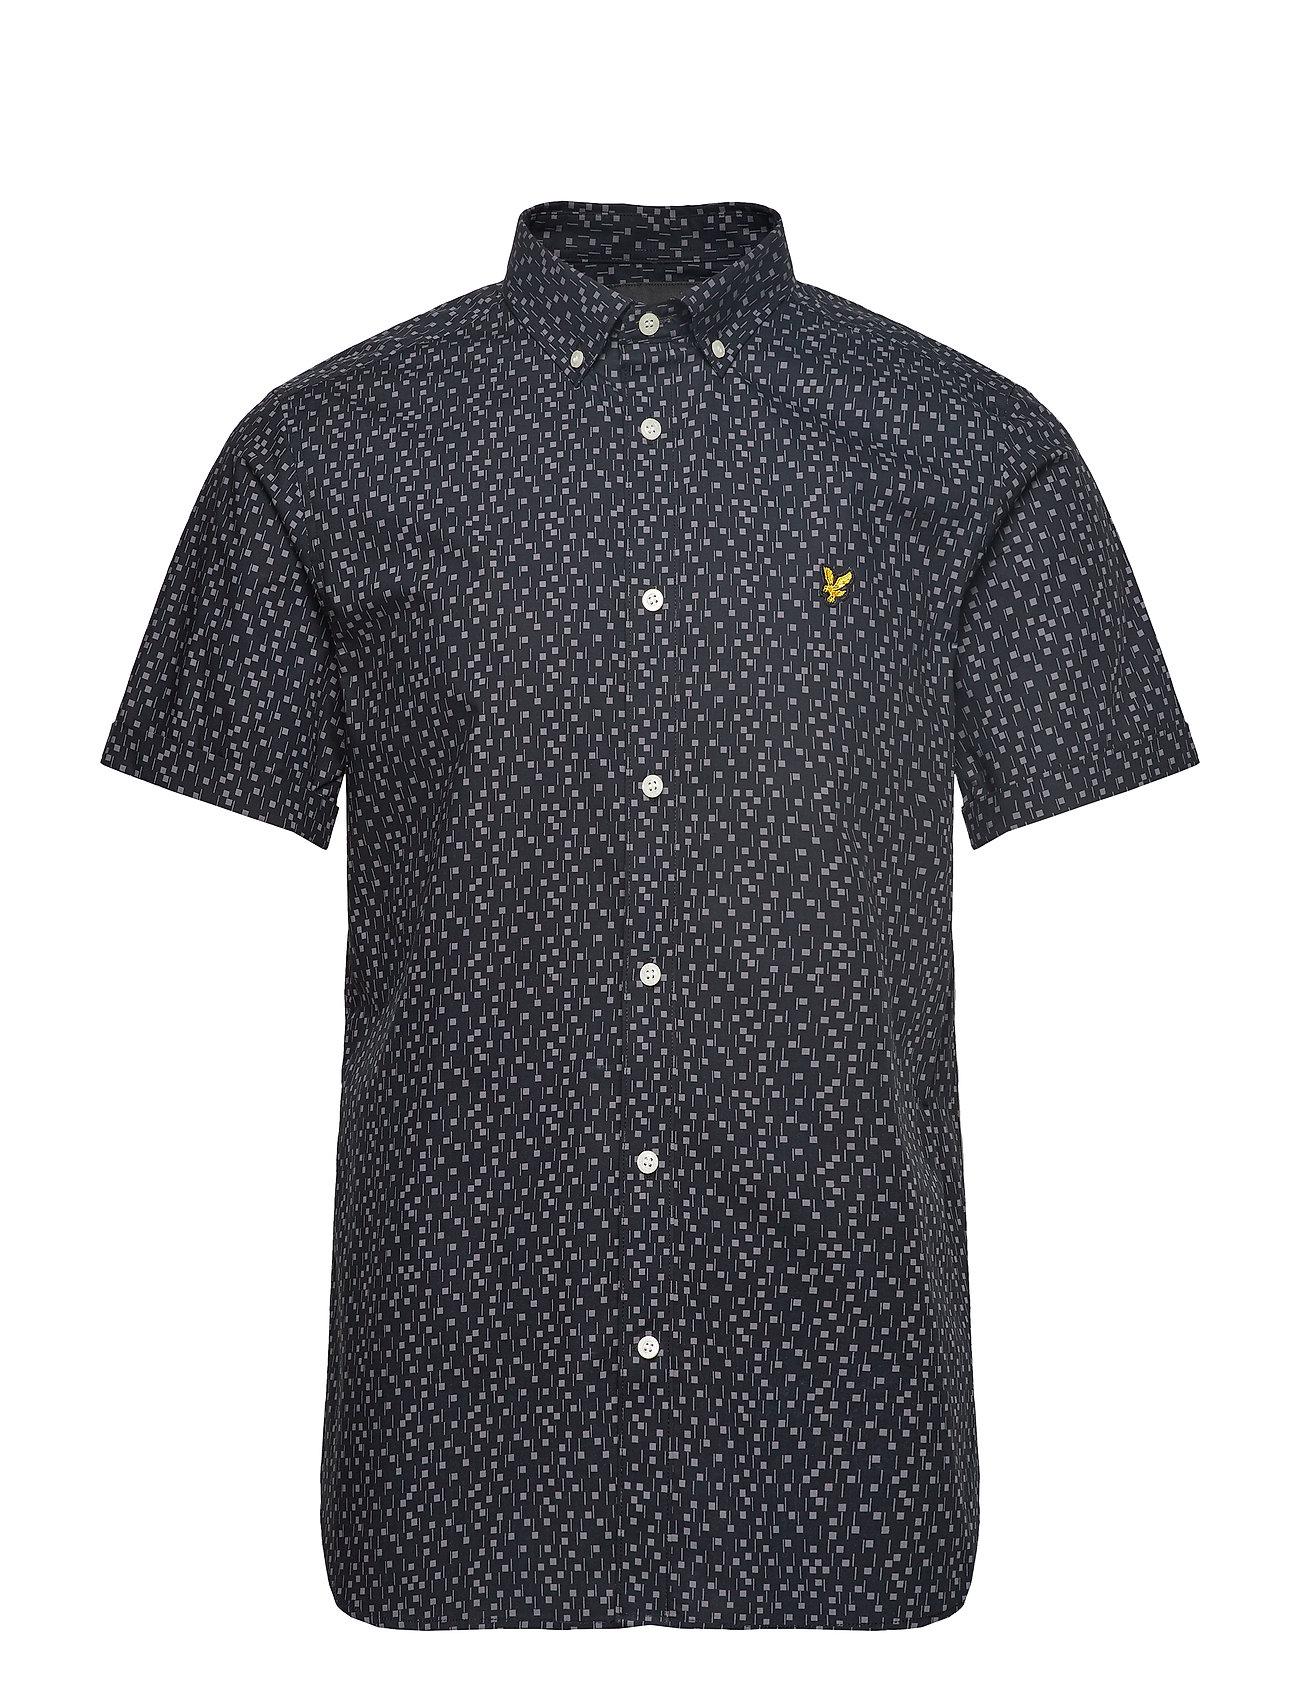 Lyle & Scott SS Print Shirt - DARK NAVY MICRO TILE PRINT